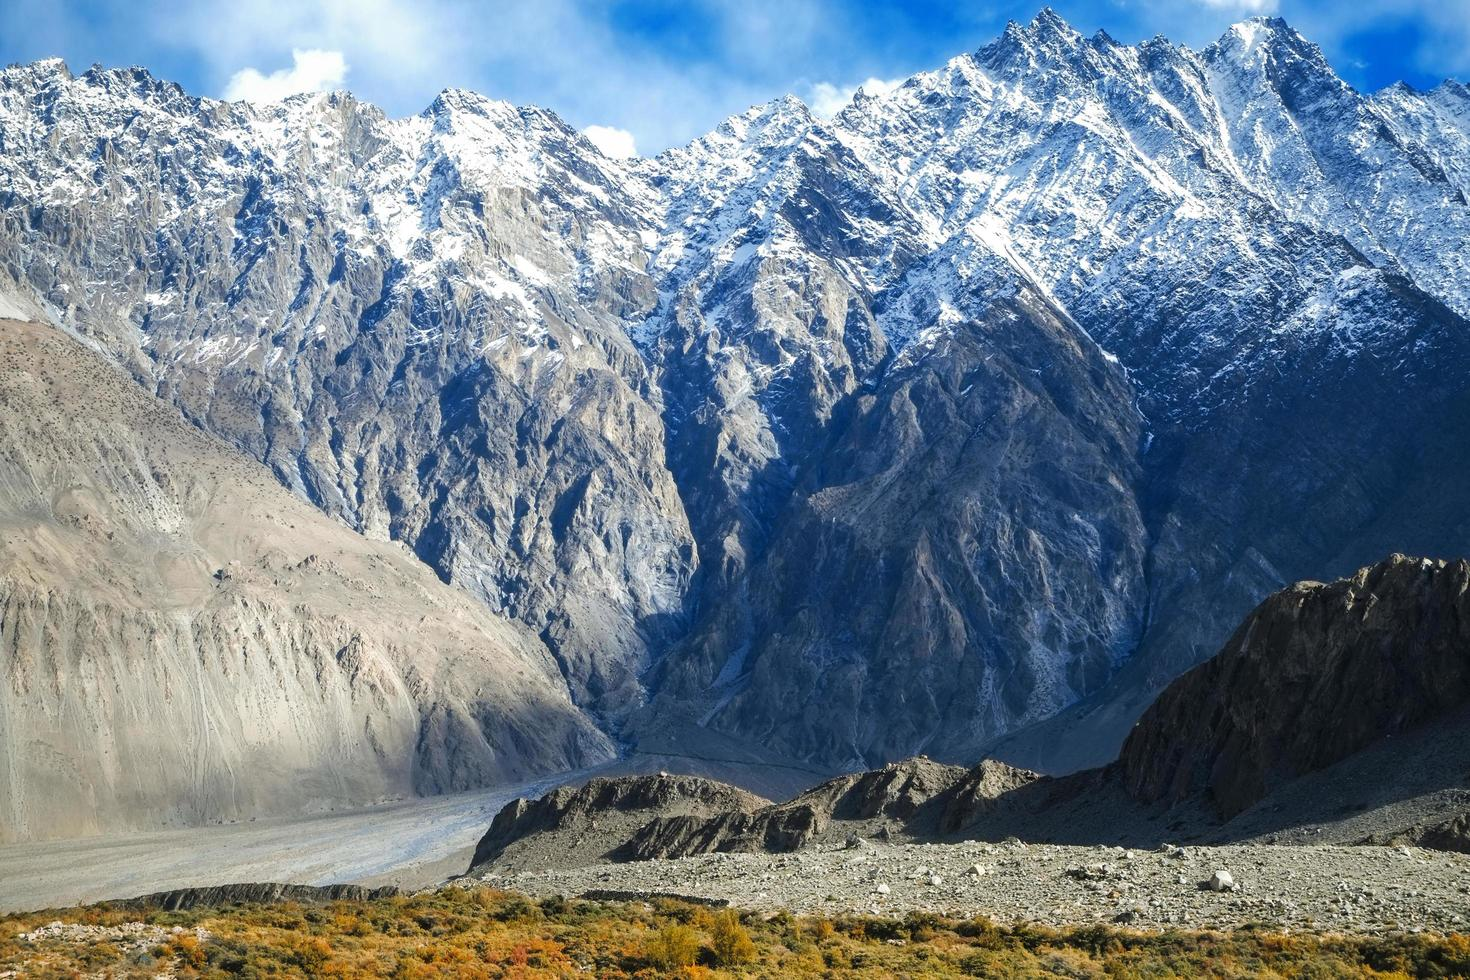 Snow capped mountains in Karakoram range in Pakistan photo